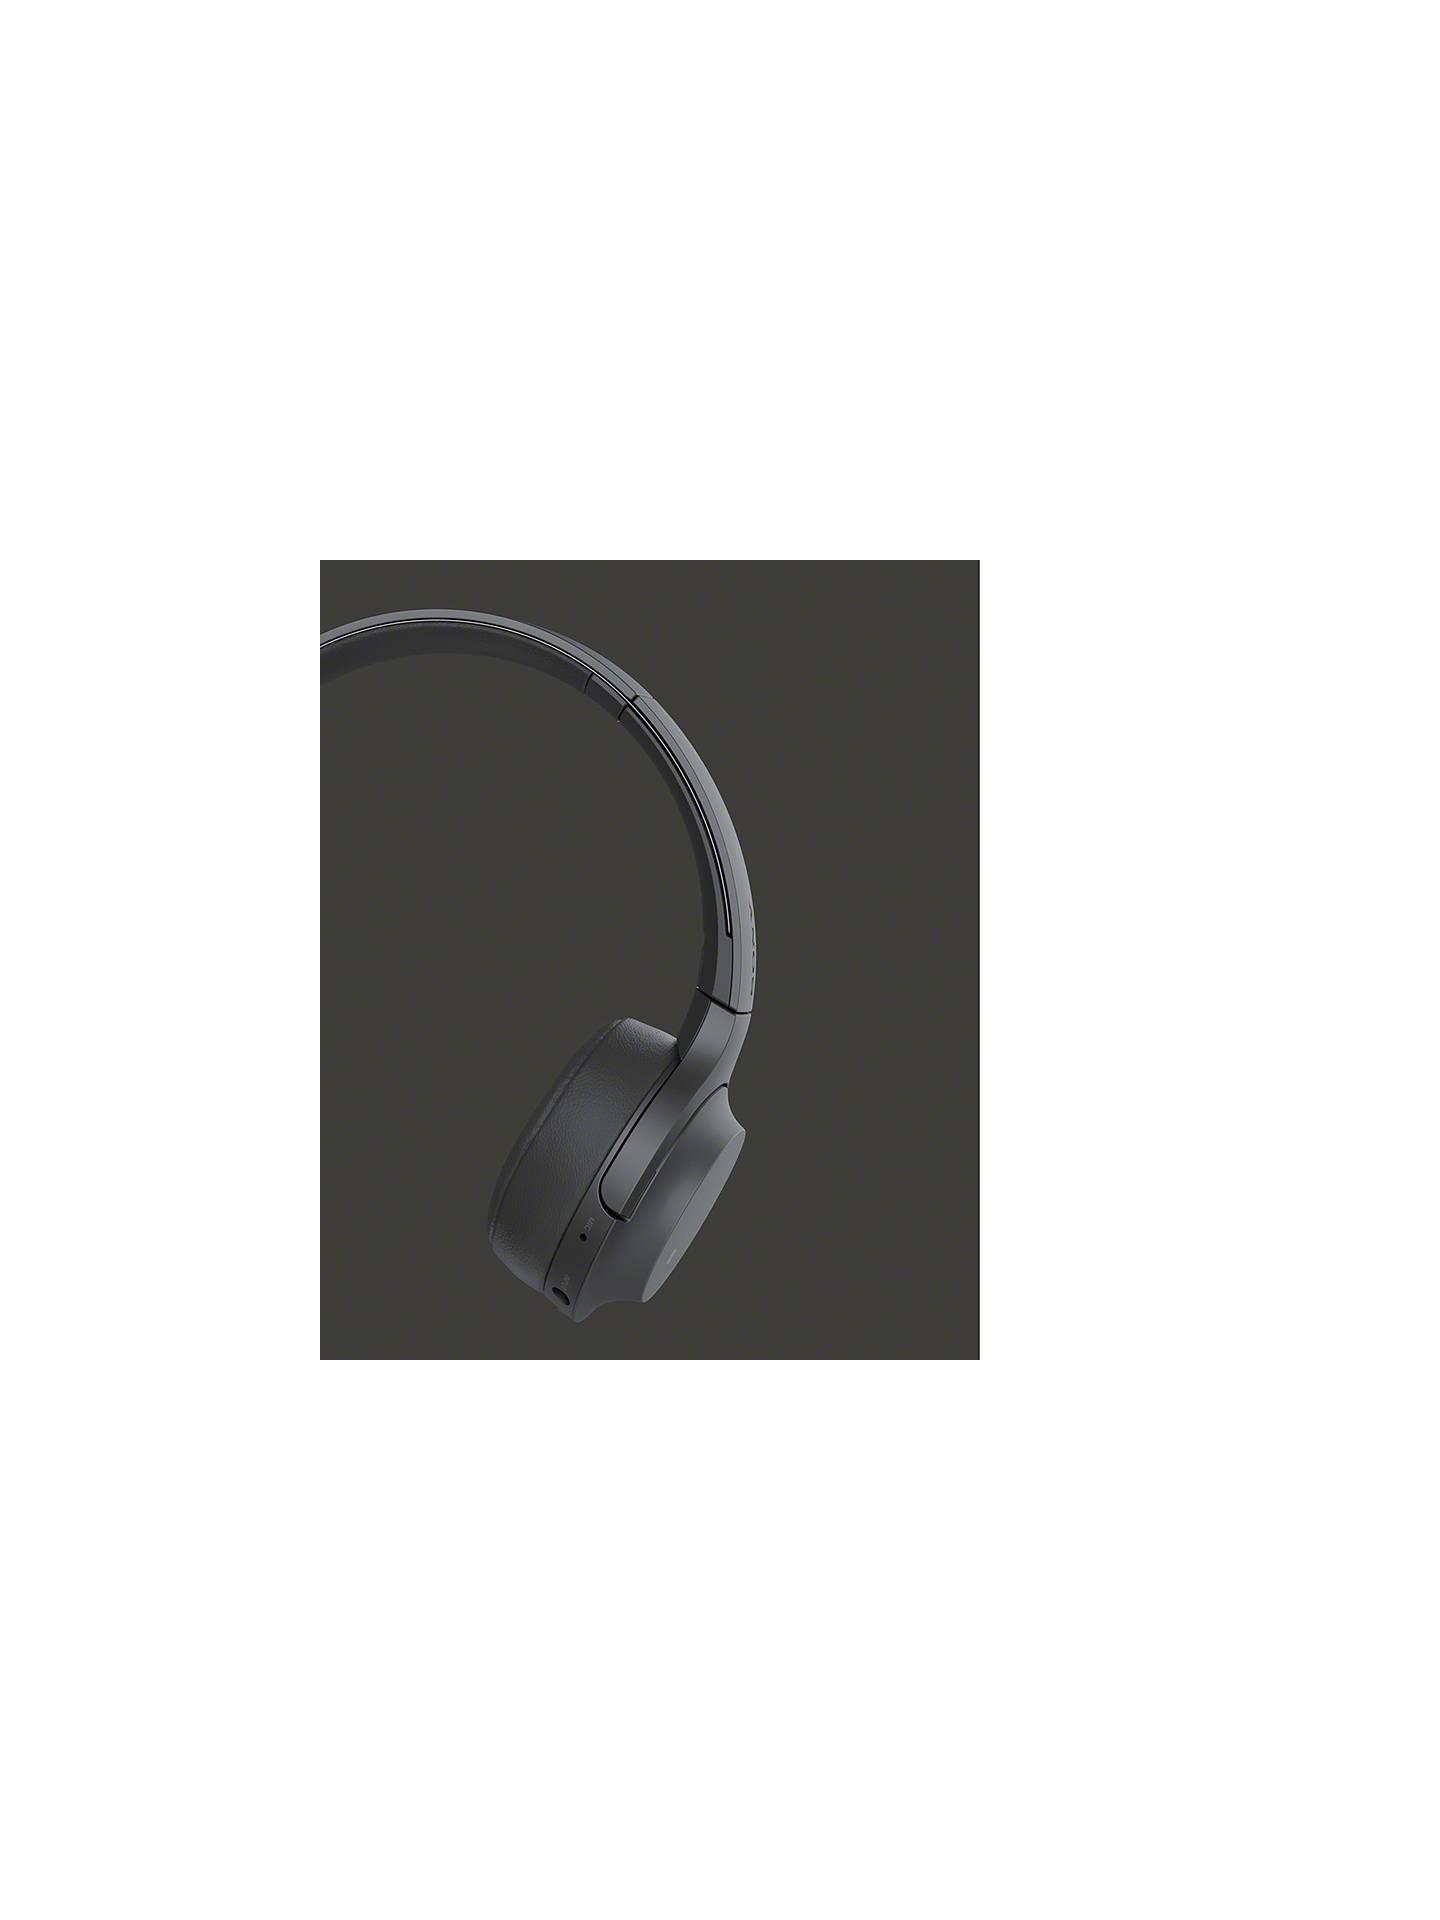 ... BuySony WH-H800 h.ear on 2 Mini Bluetooth NFC Wireless On-Ear ... 1f76e8c531228